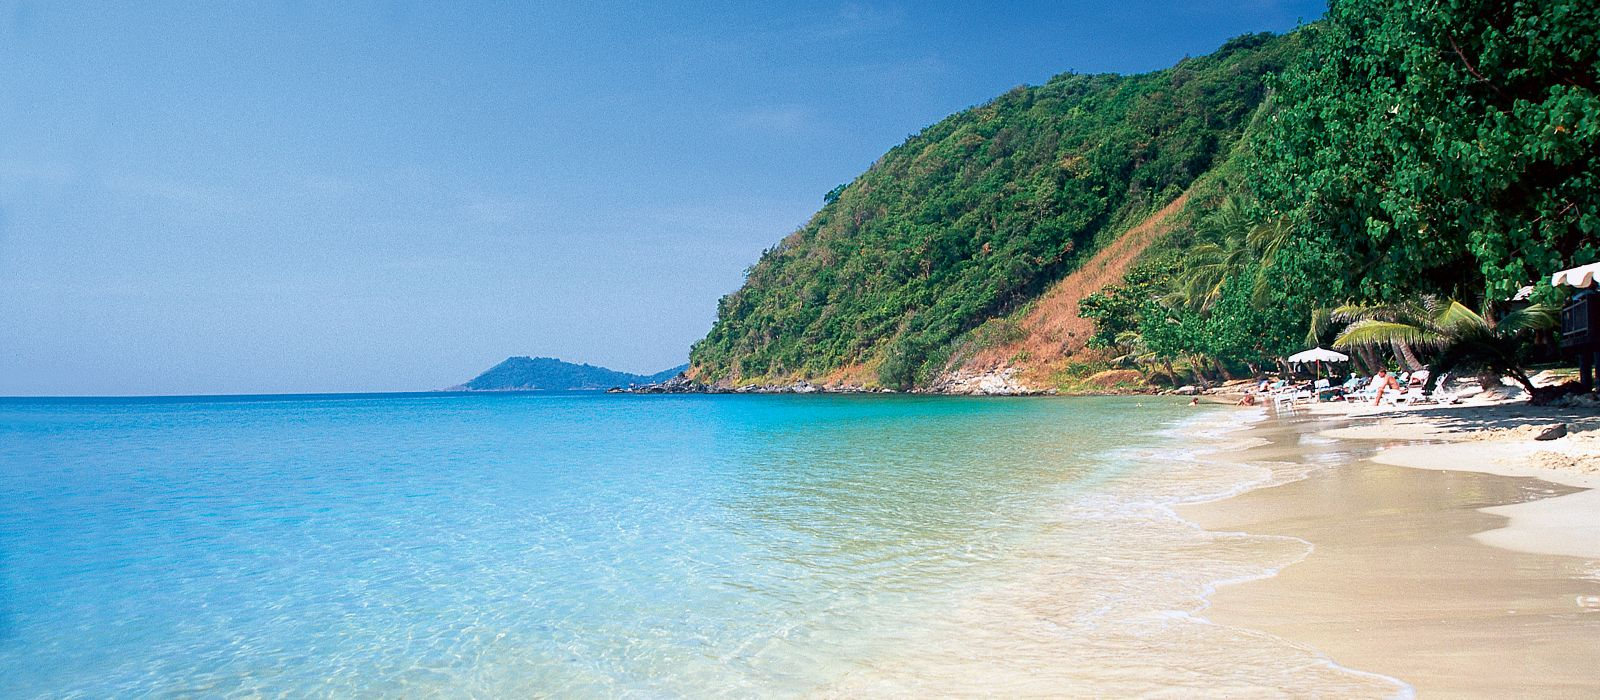 Destination Koh Phangan Thailand